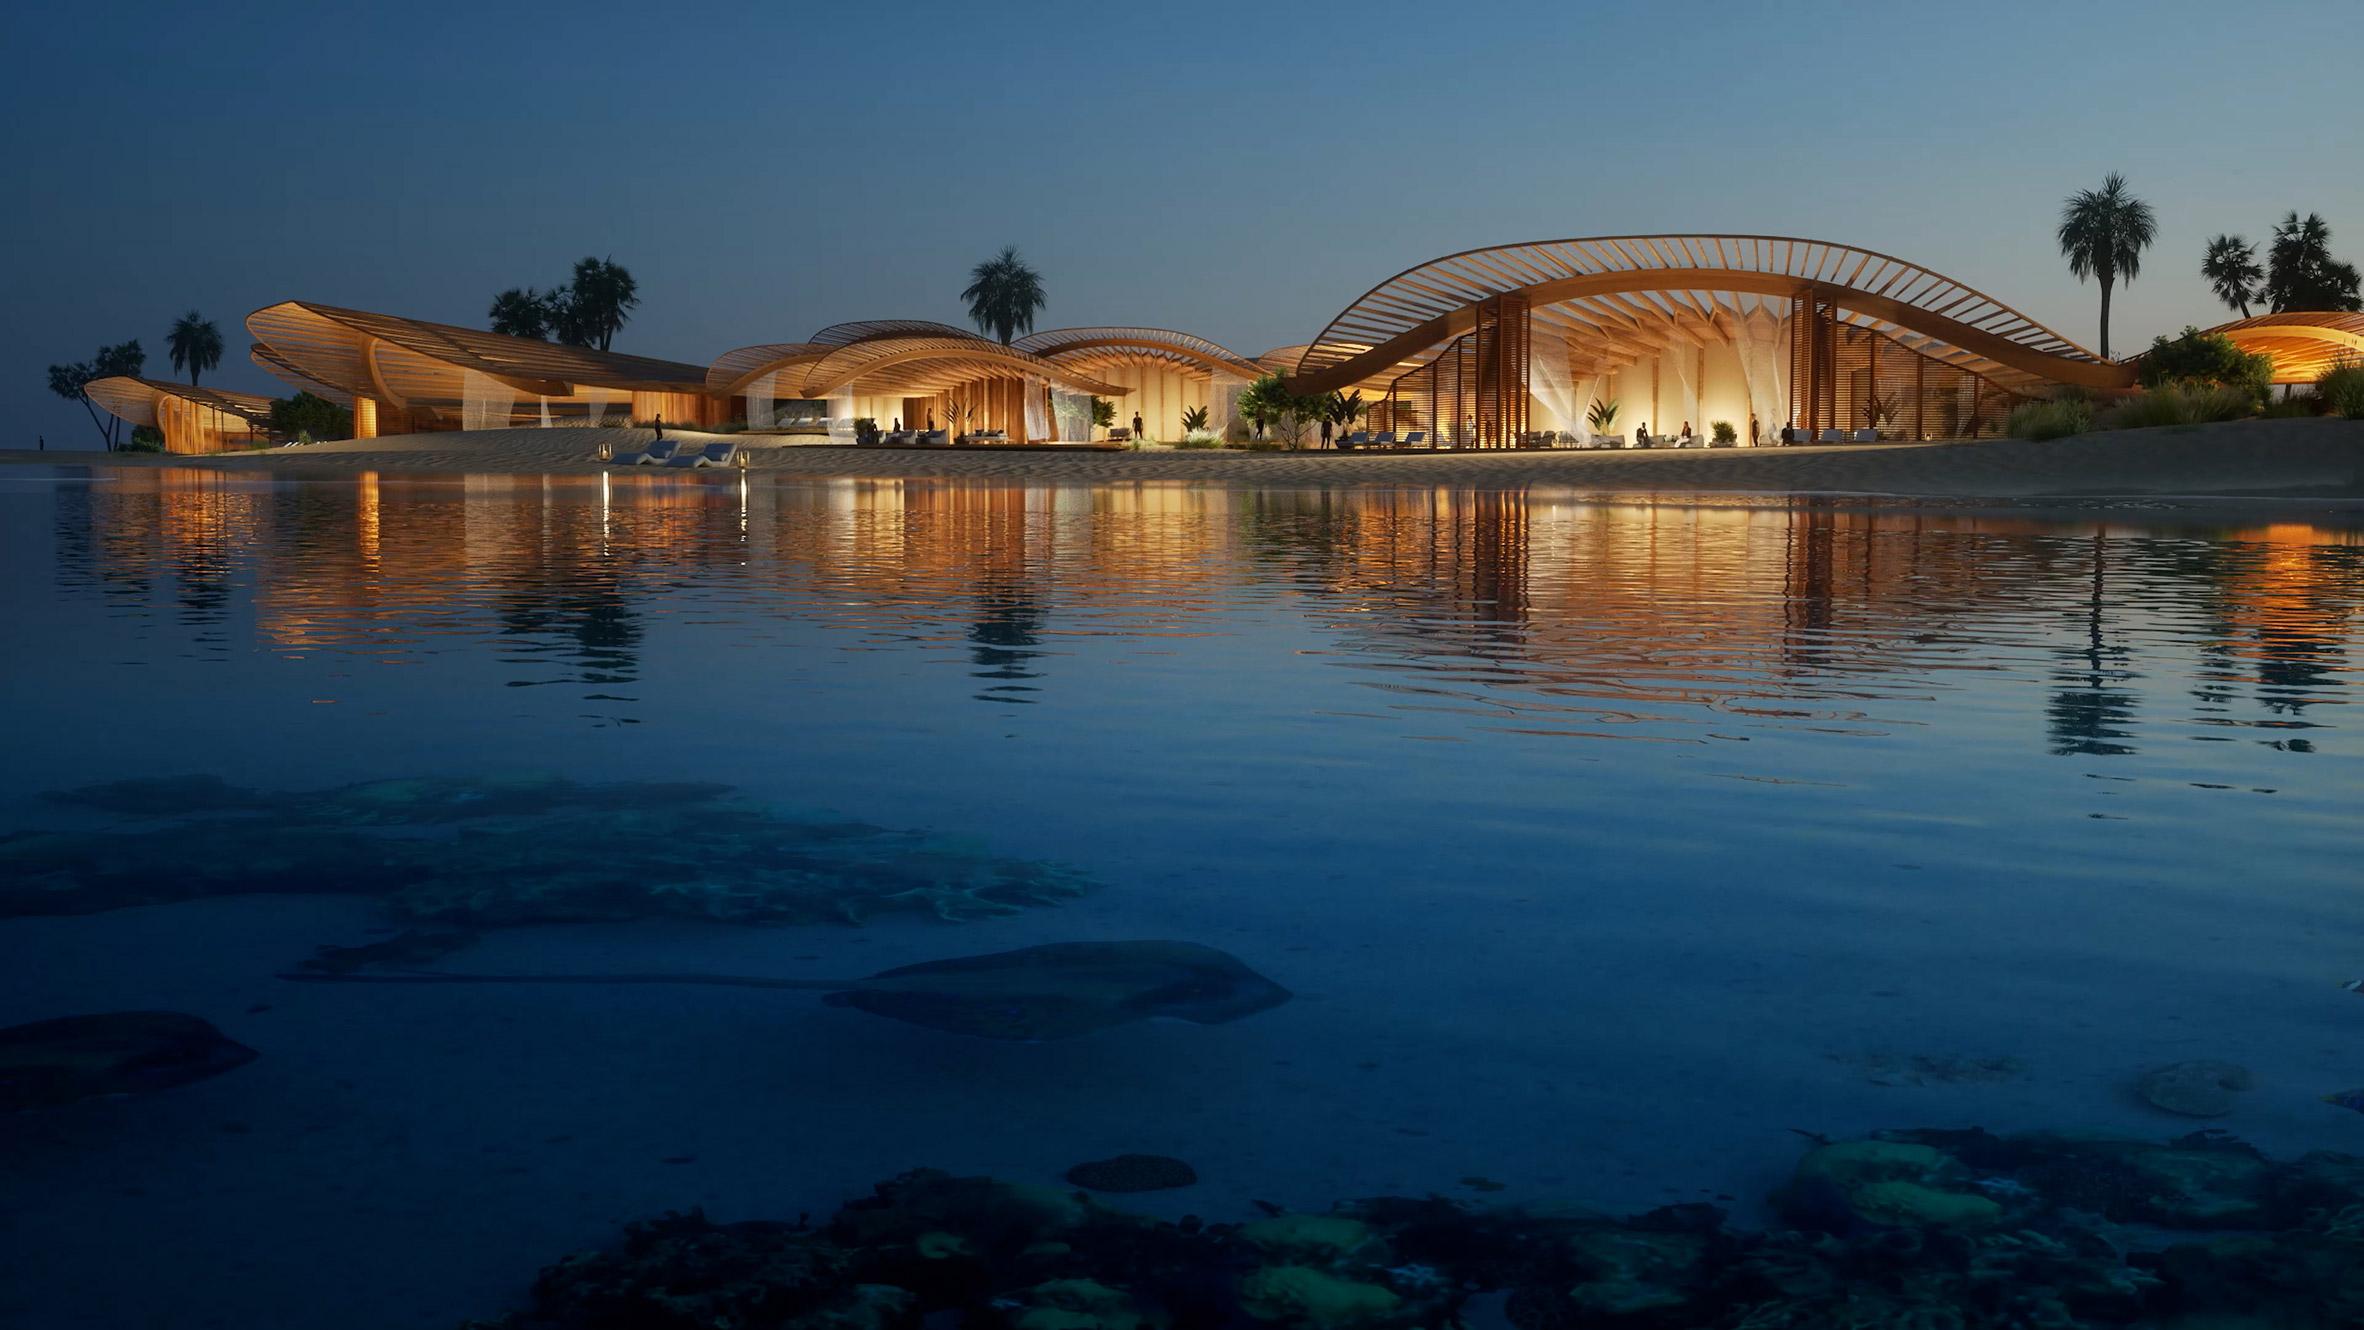 Villa overlooking the Red Sea in Saudi Arabia